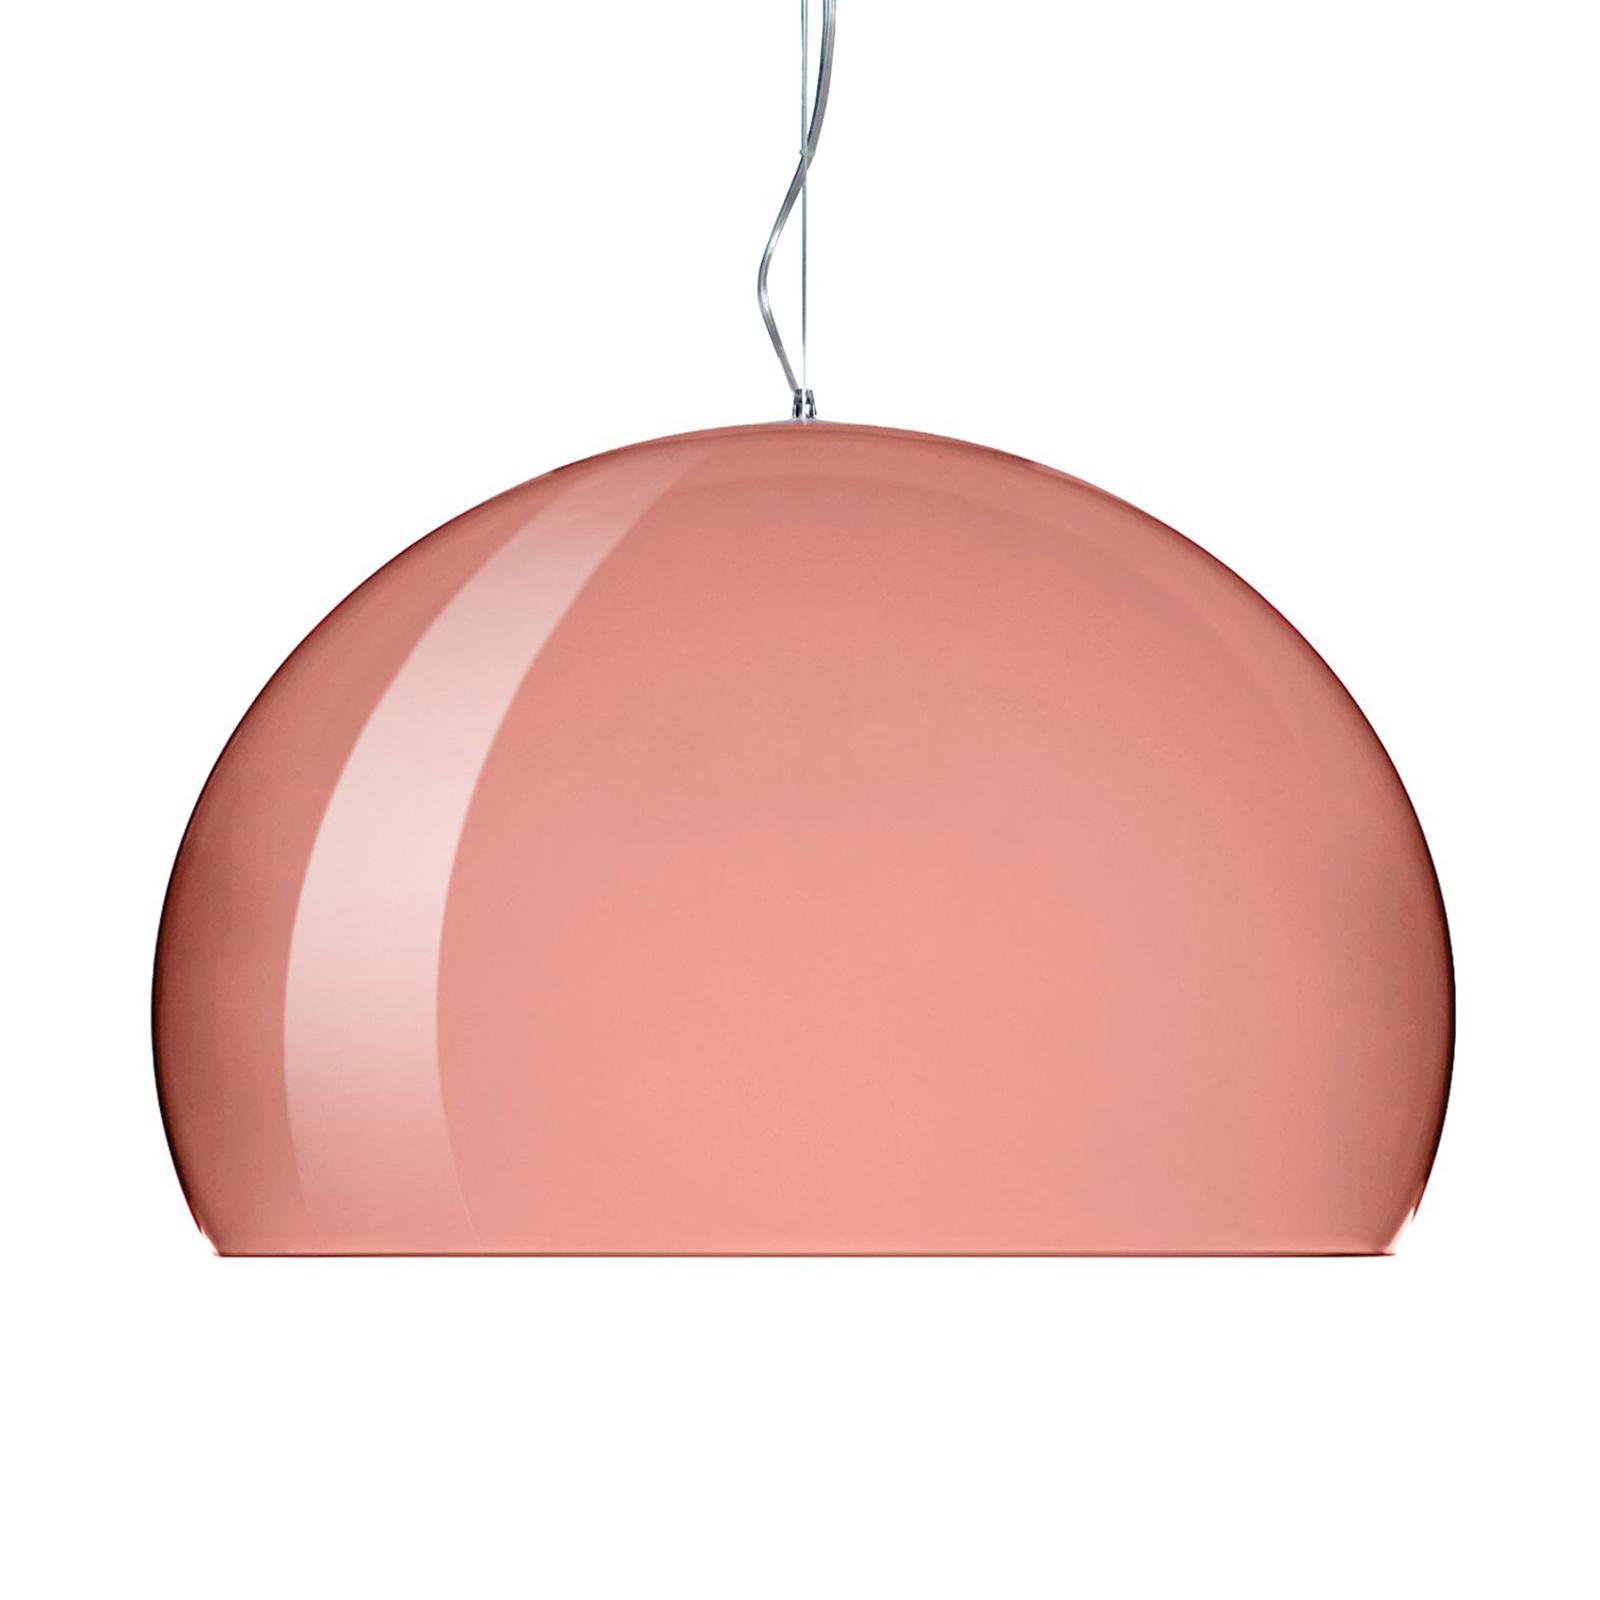 Kartell FL/Y - LED-Pendellampe, kupfer glänzend